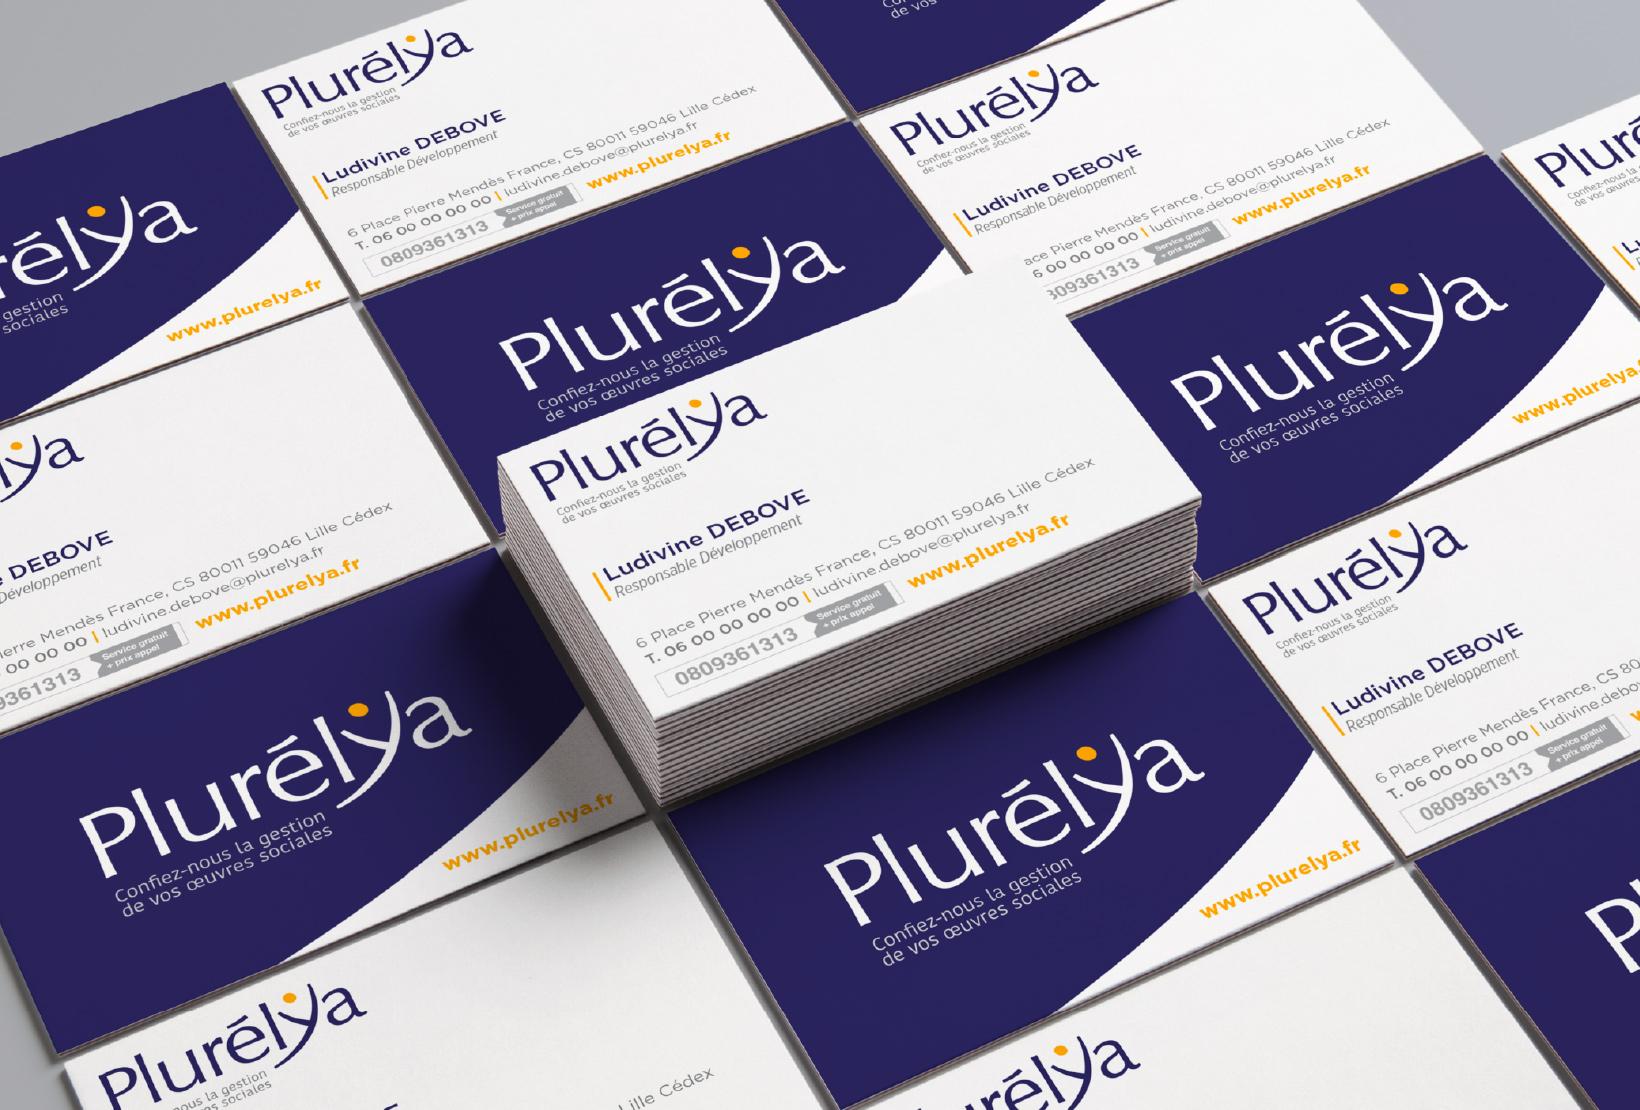 Cartes visite Plurélya